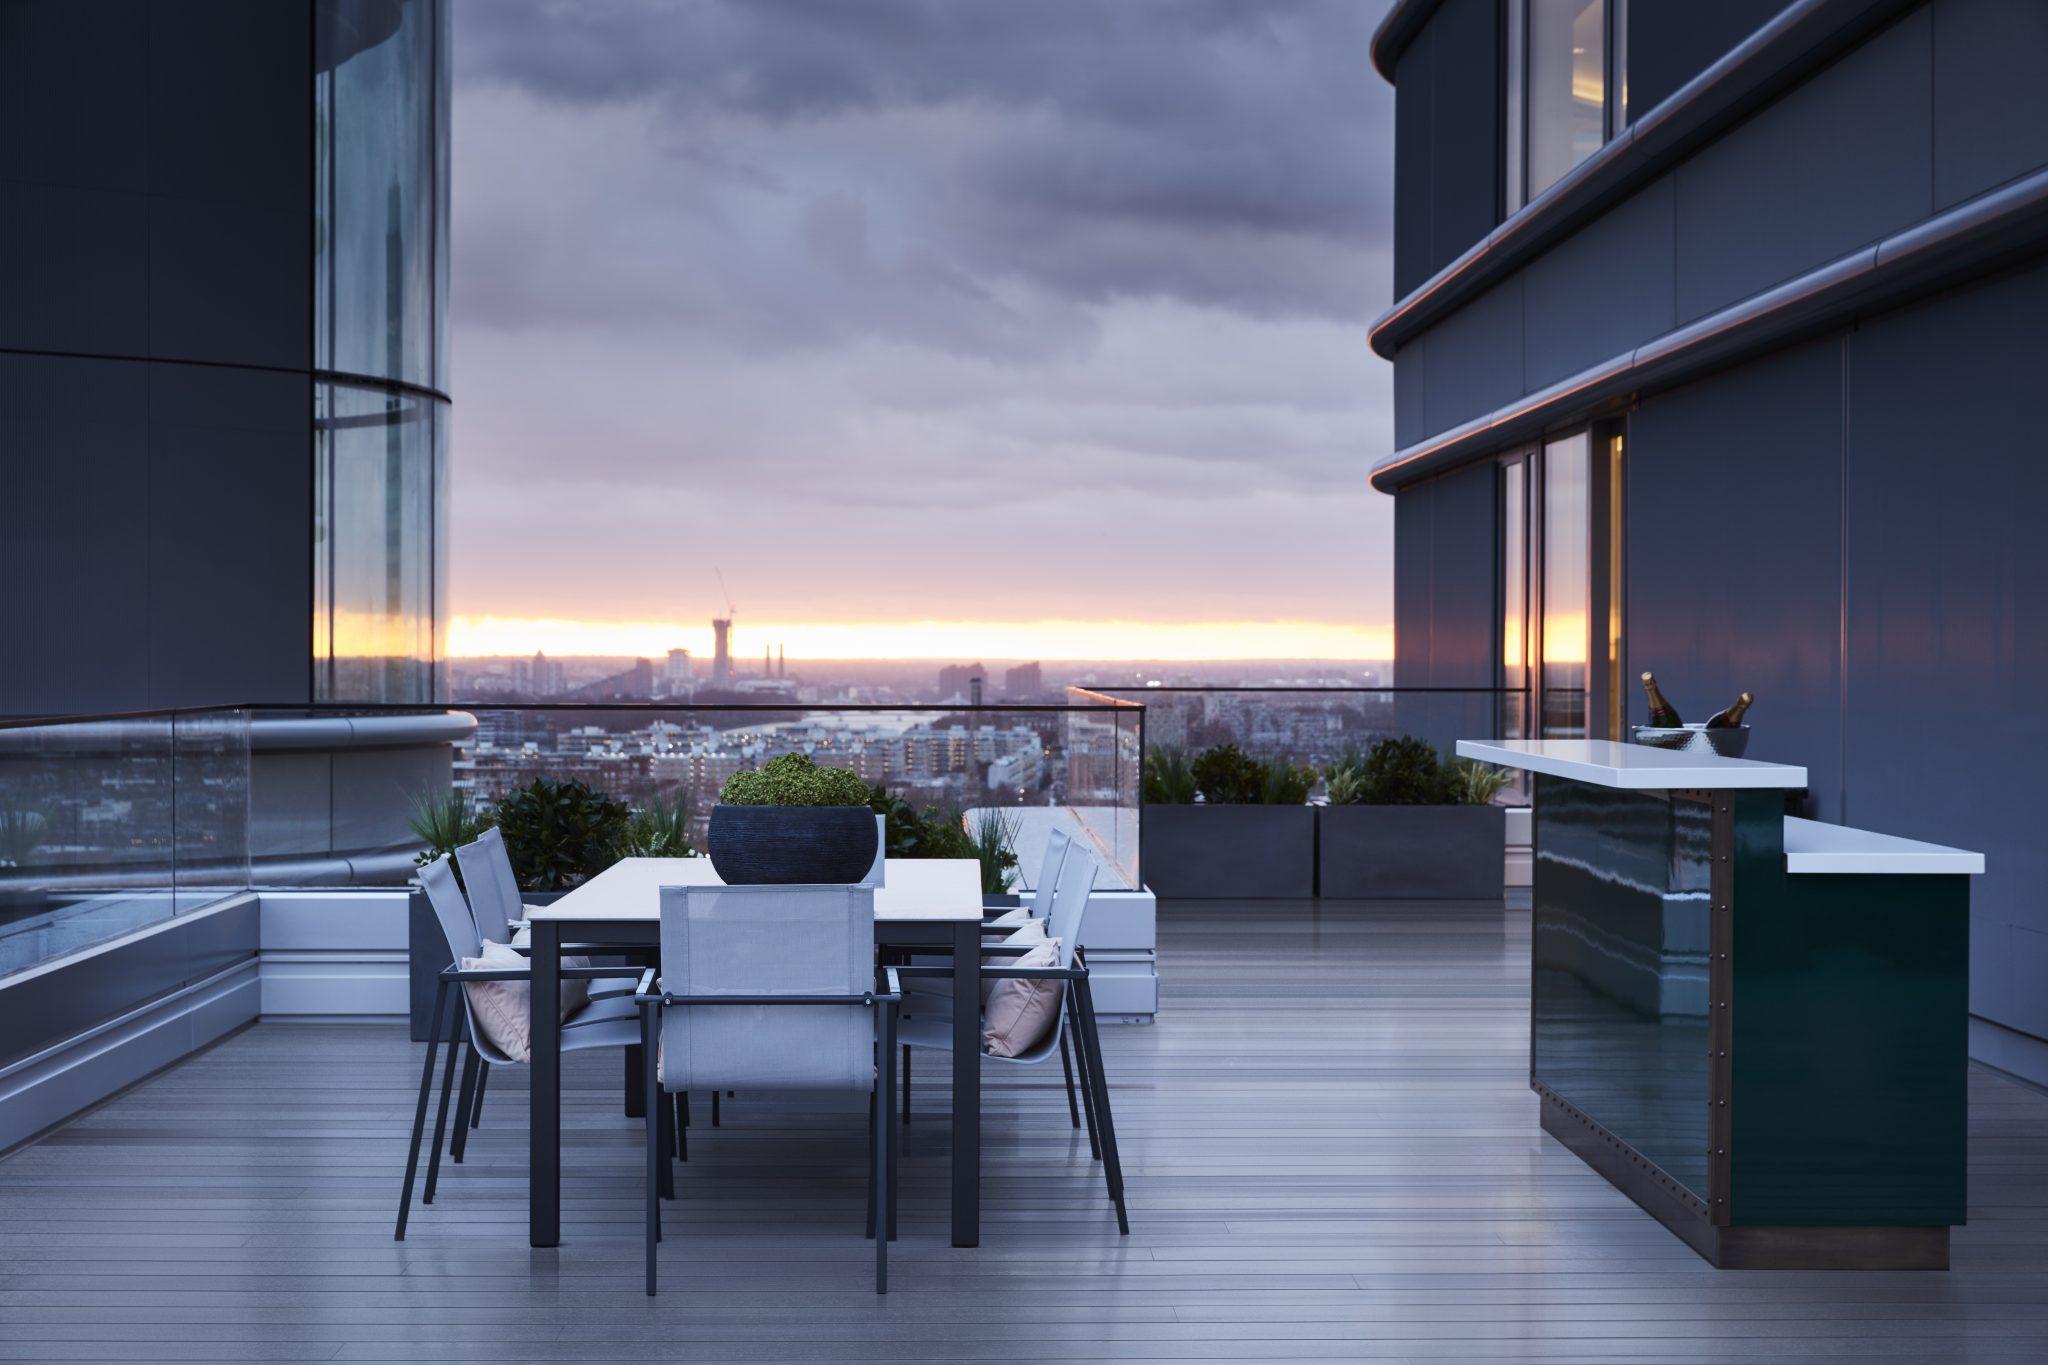 Bradywilliams A Bespoke London Interior Design Studio